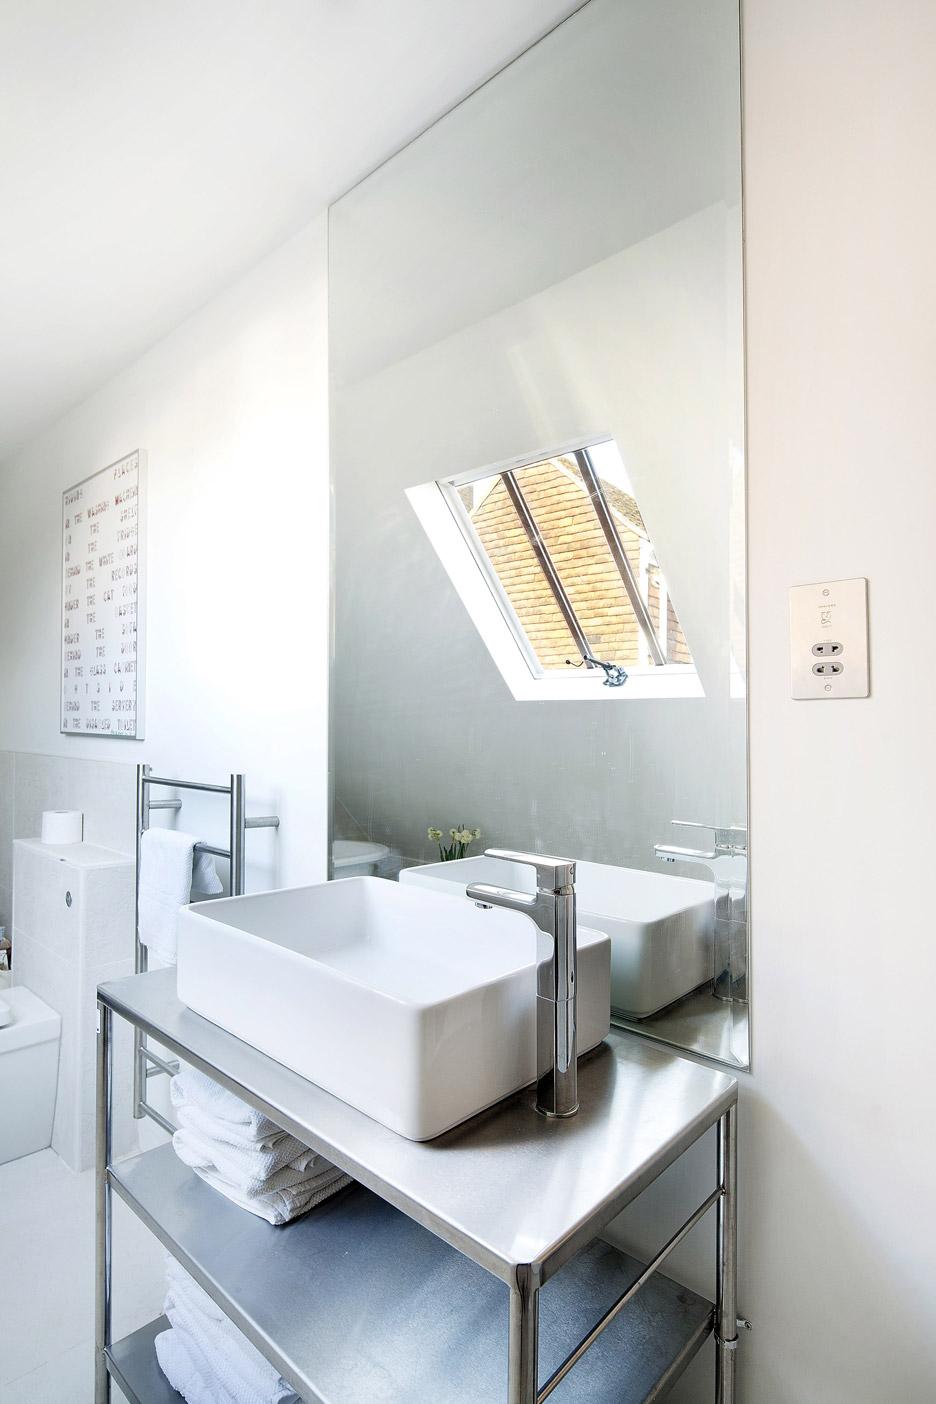 architecture_ambulance_house__design_studia_interiors_osnovadesign_osnova_poltava_18